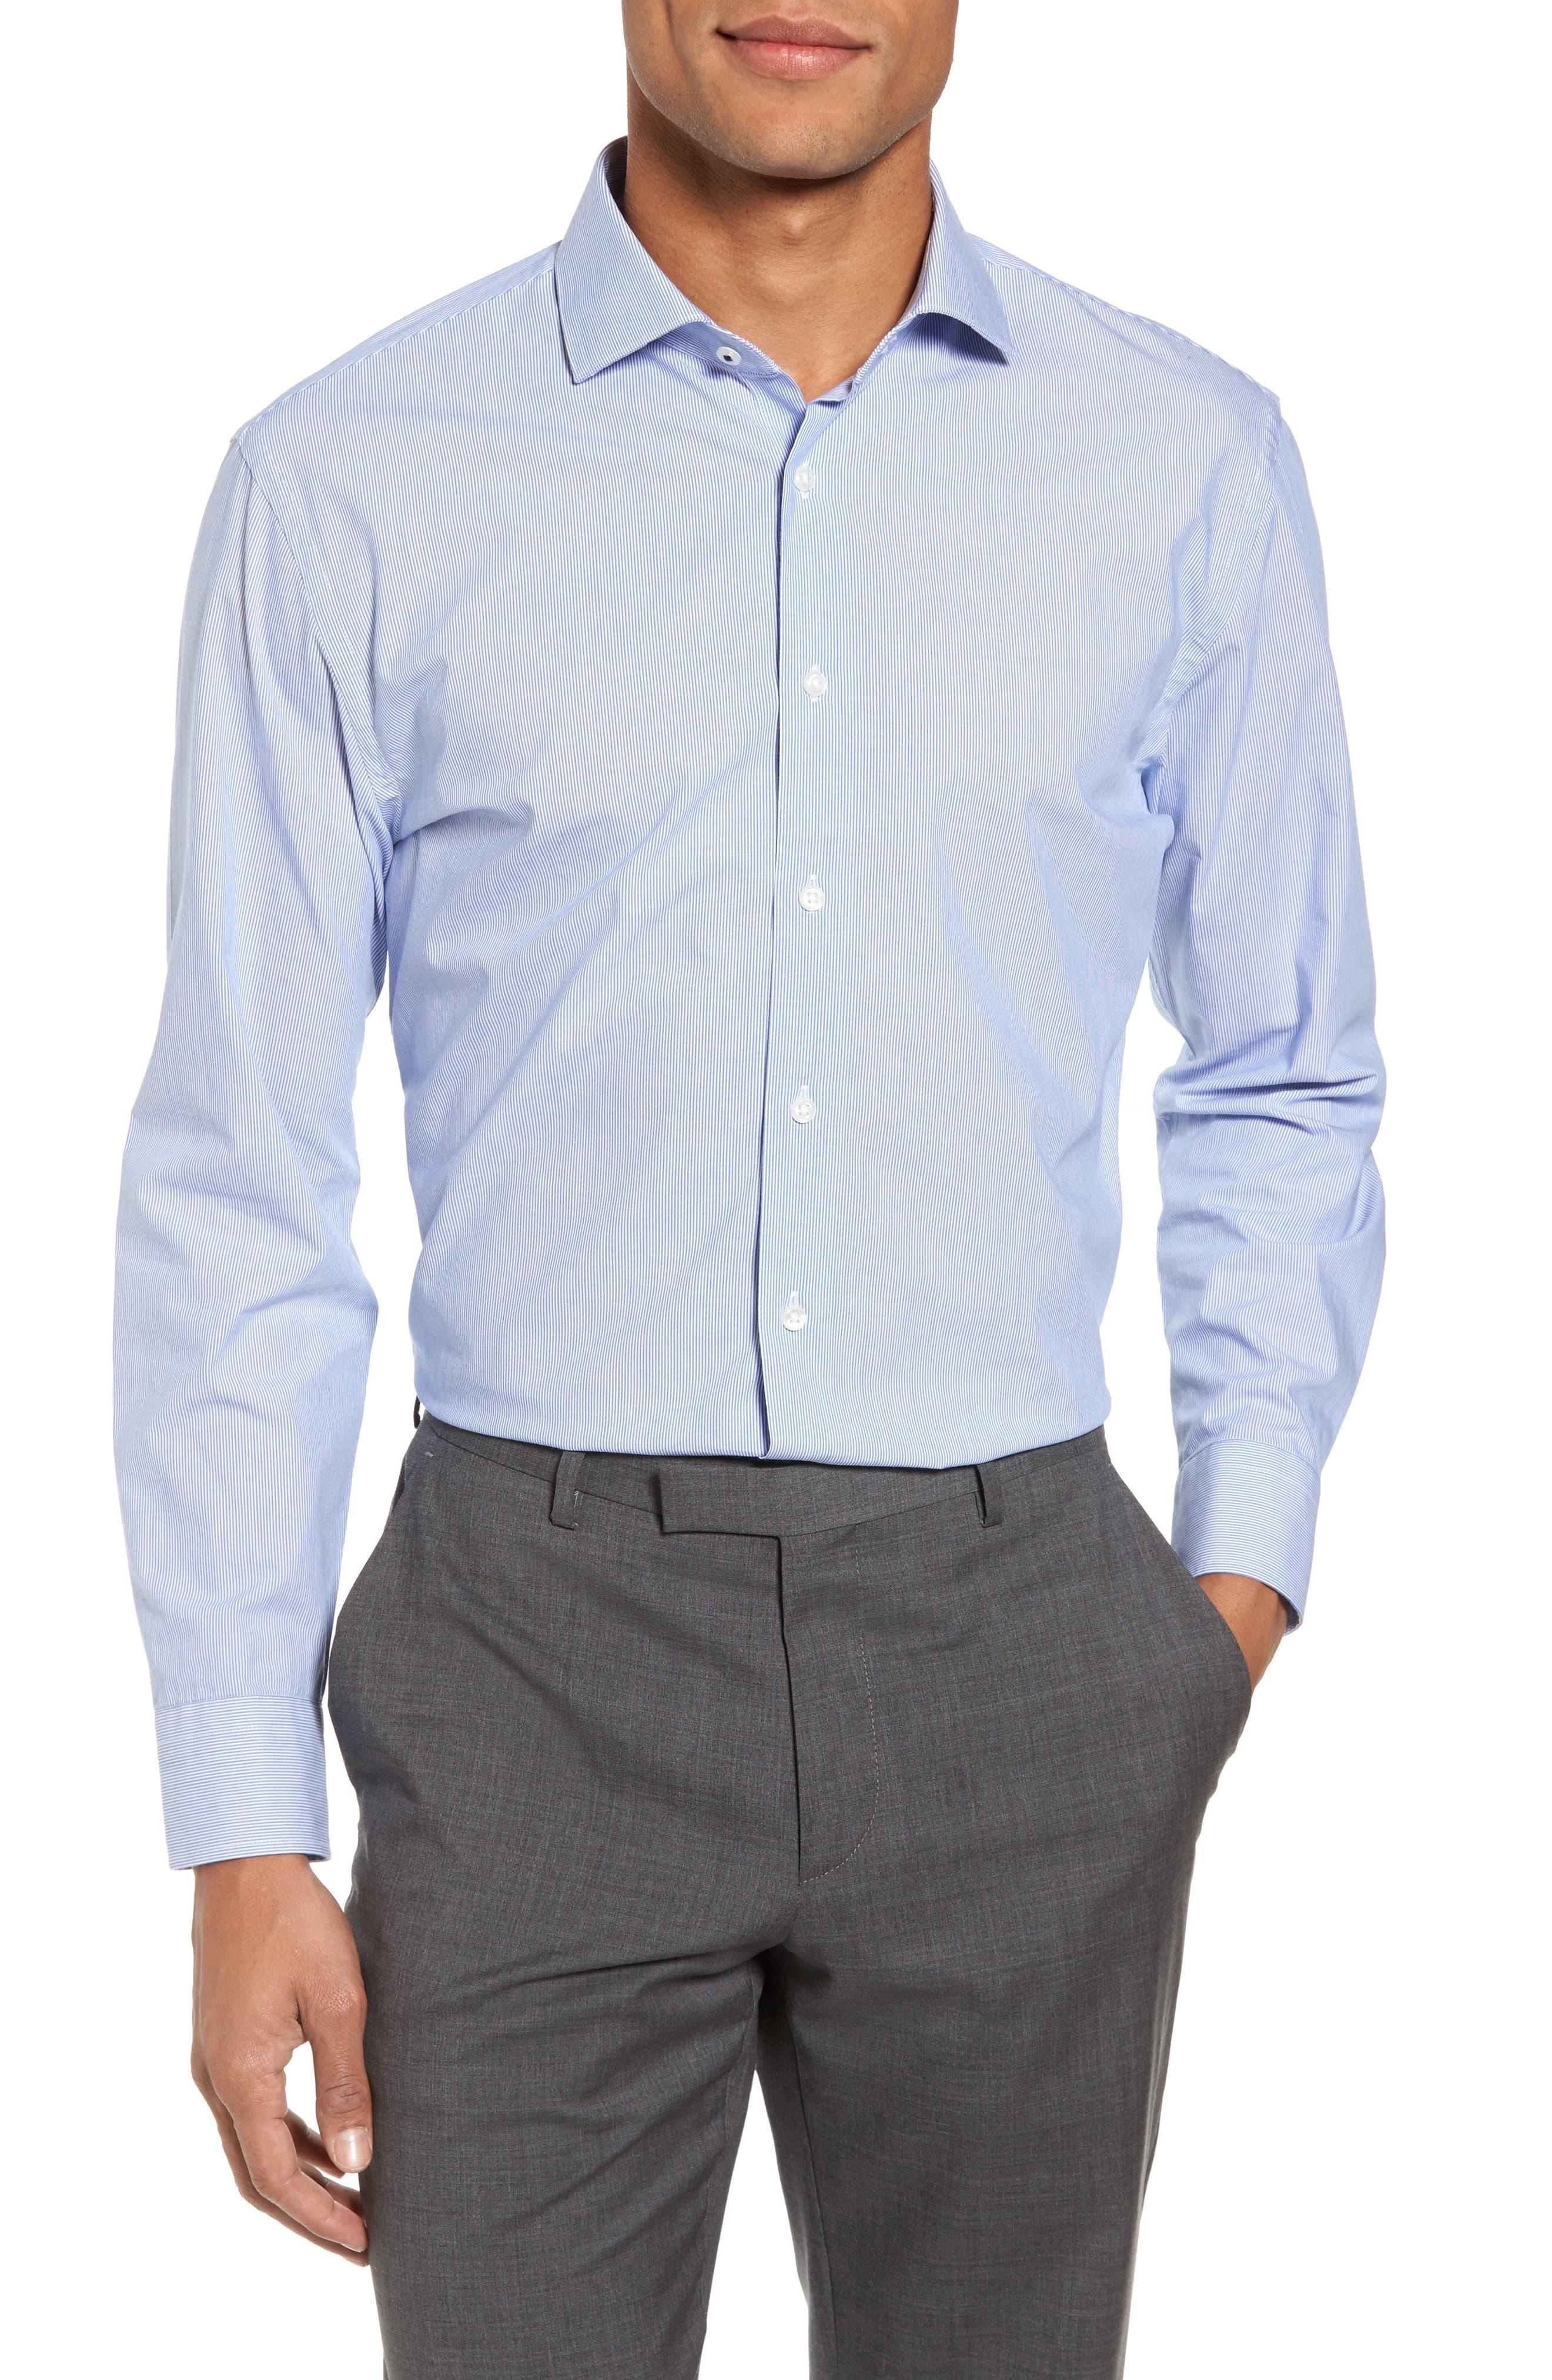 Tech-Smart Trim Fit Stretch Stripe Dress Shirt,                         Main,                         color, Blue Yonder